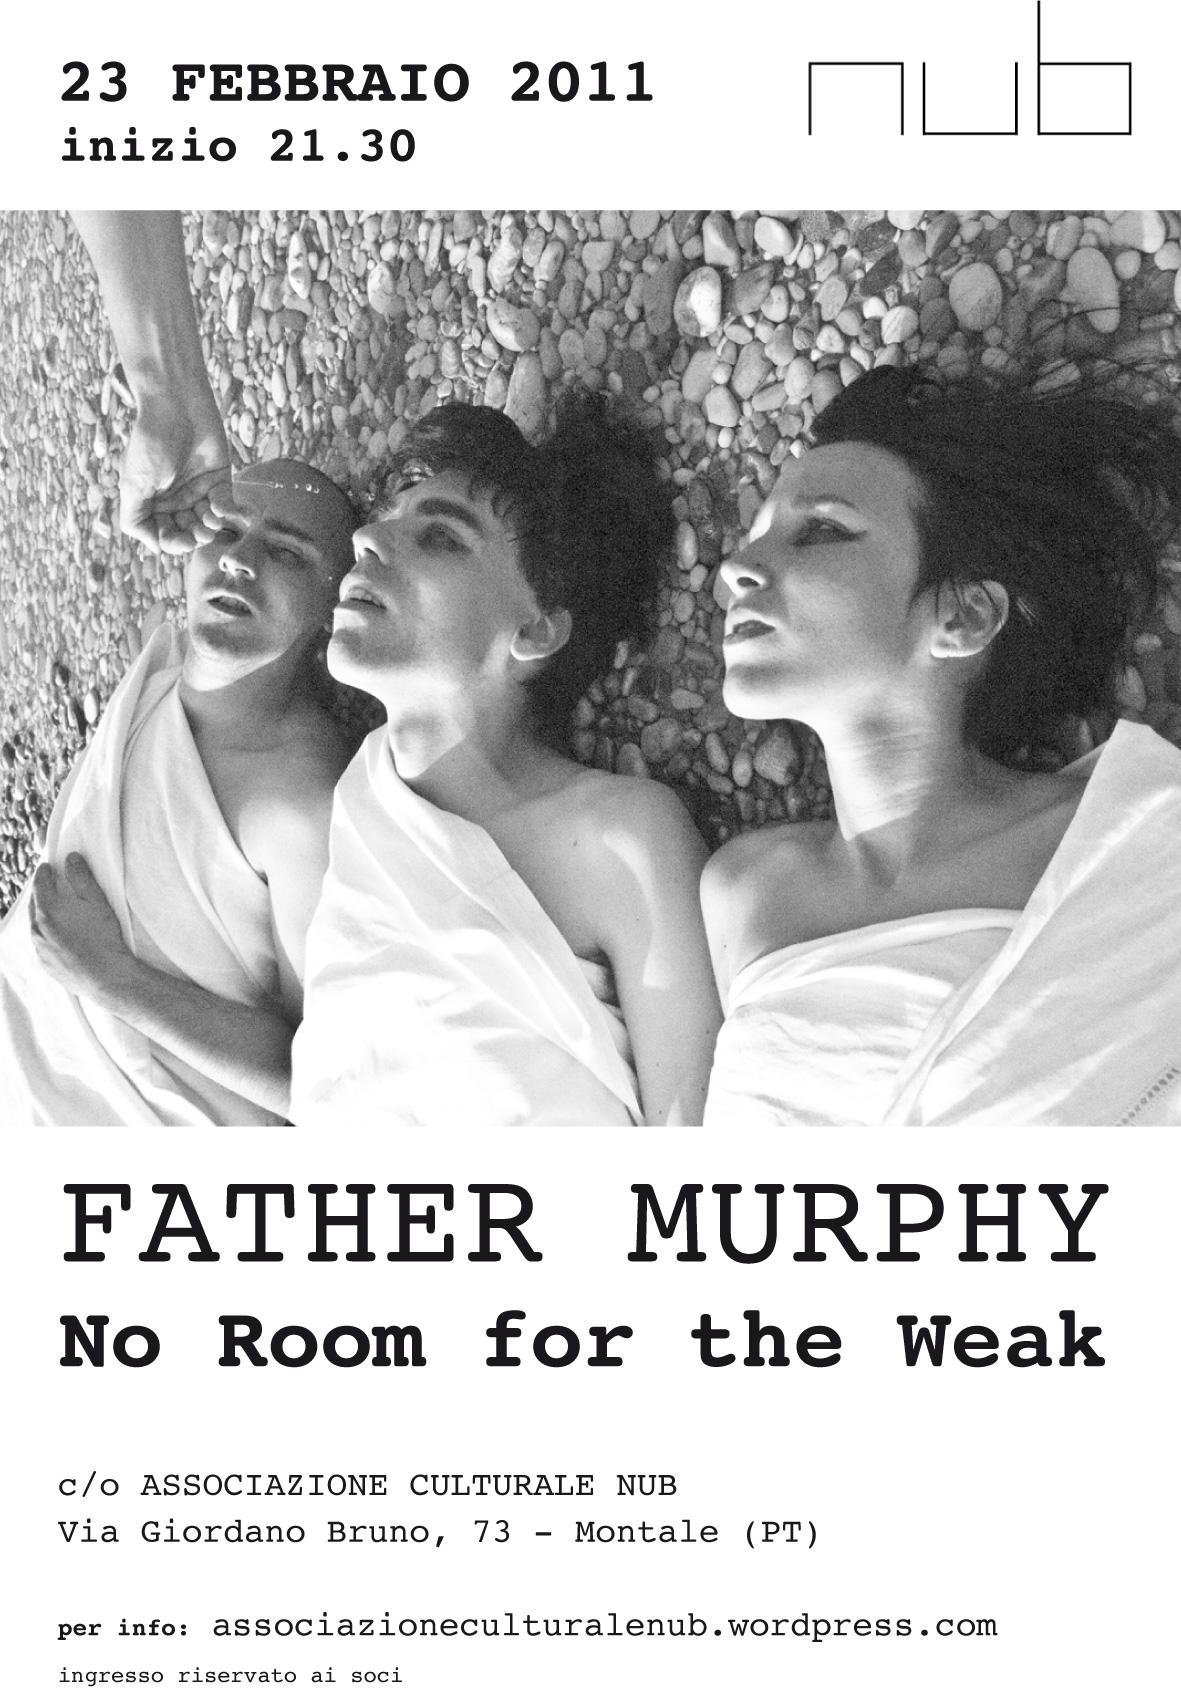 FATHER MURPHY | 23.02.2011